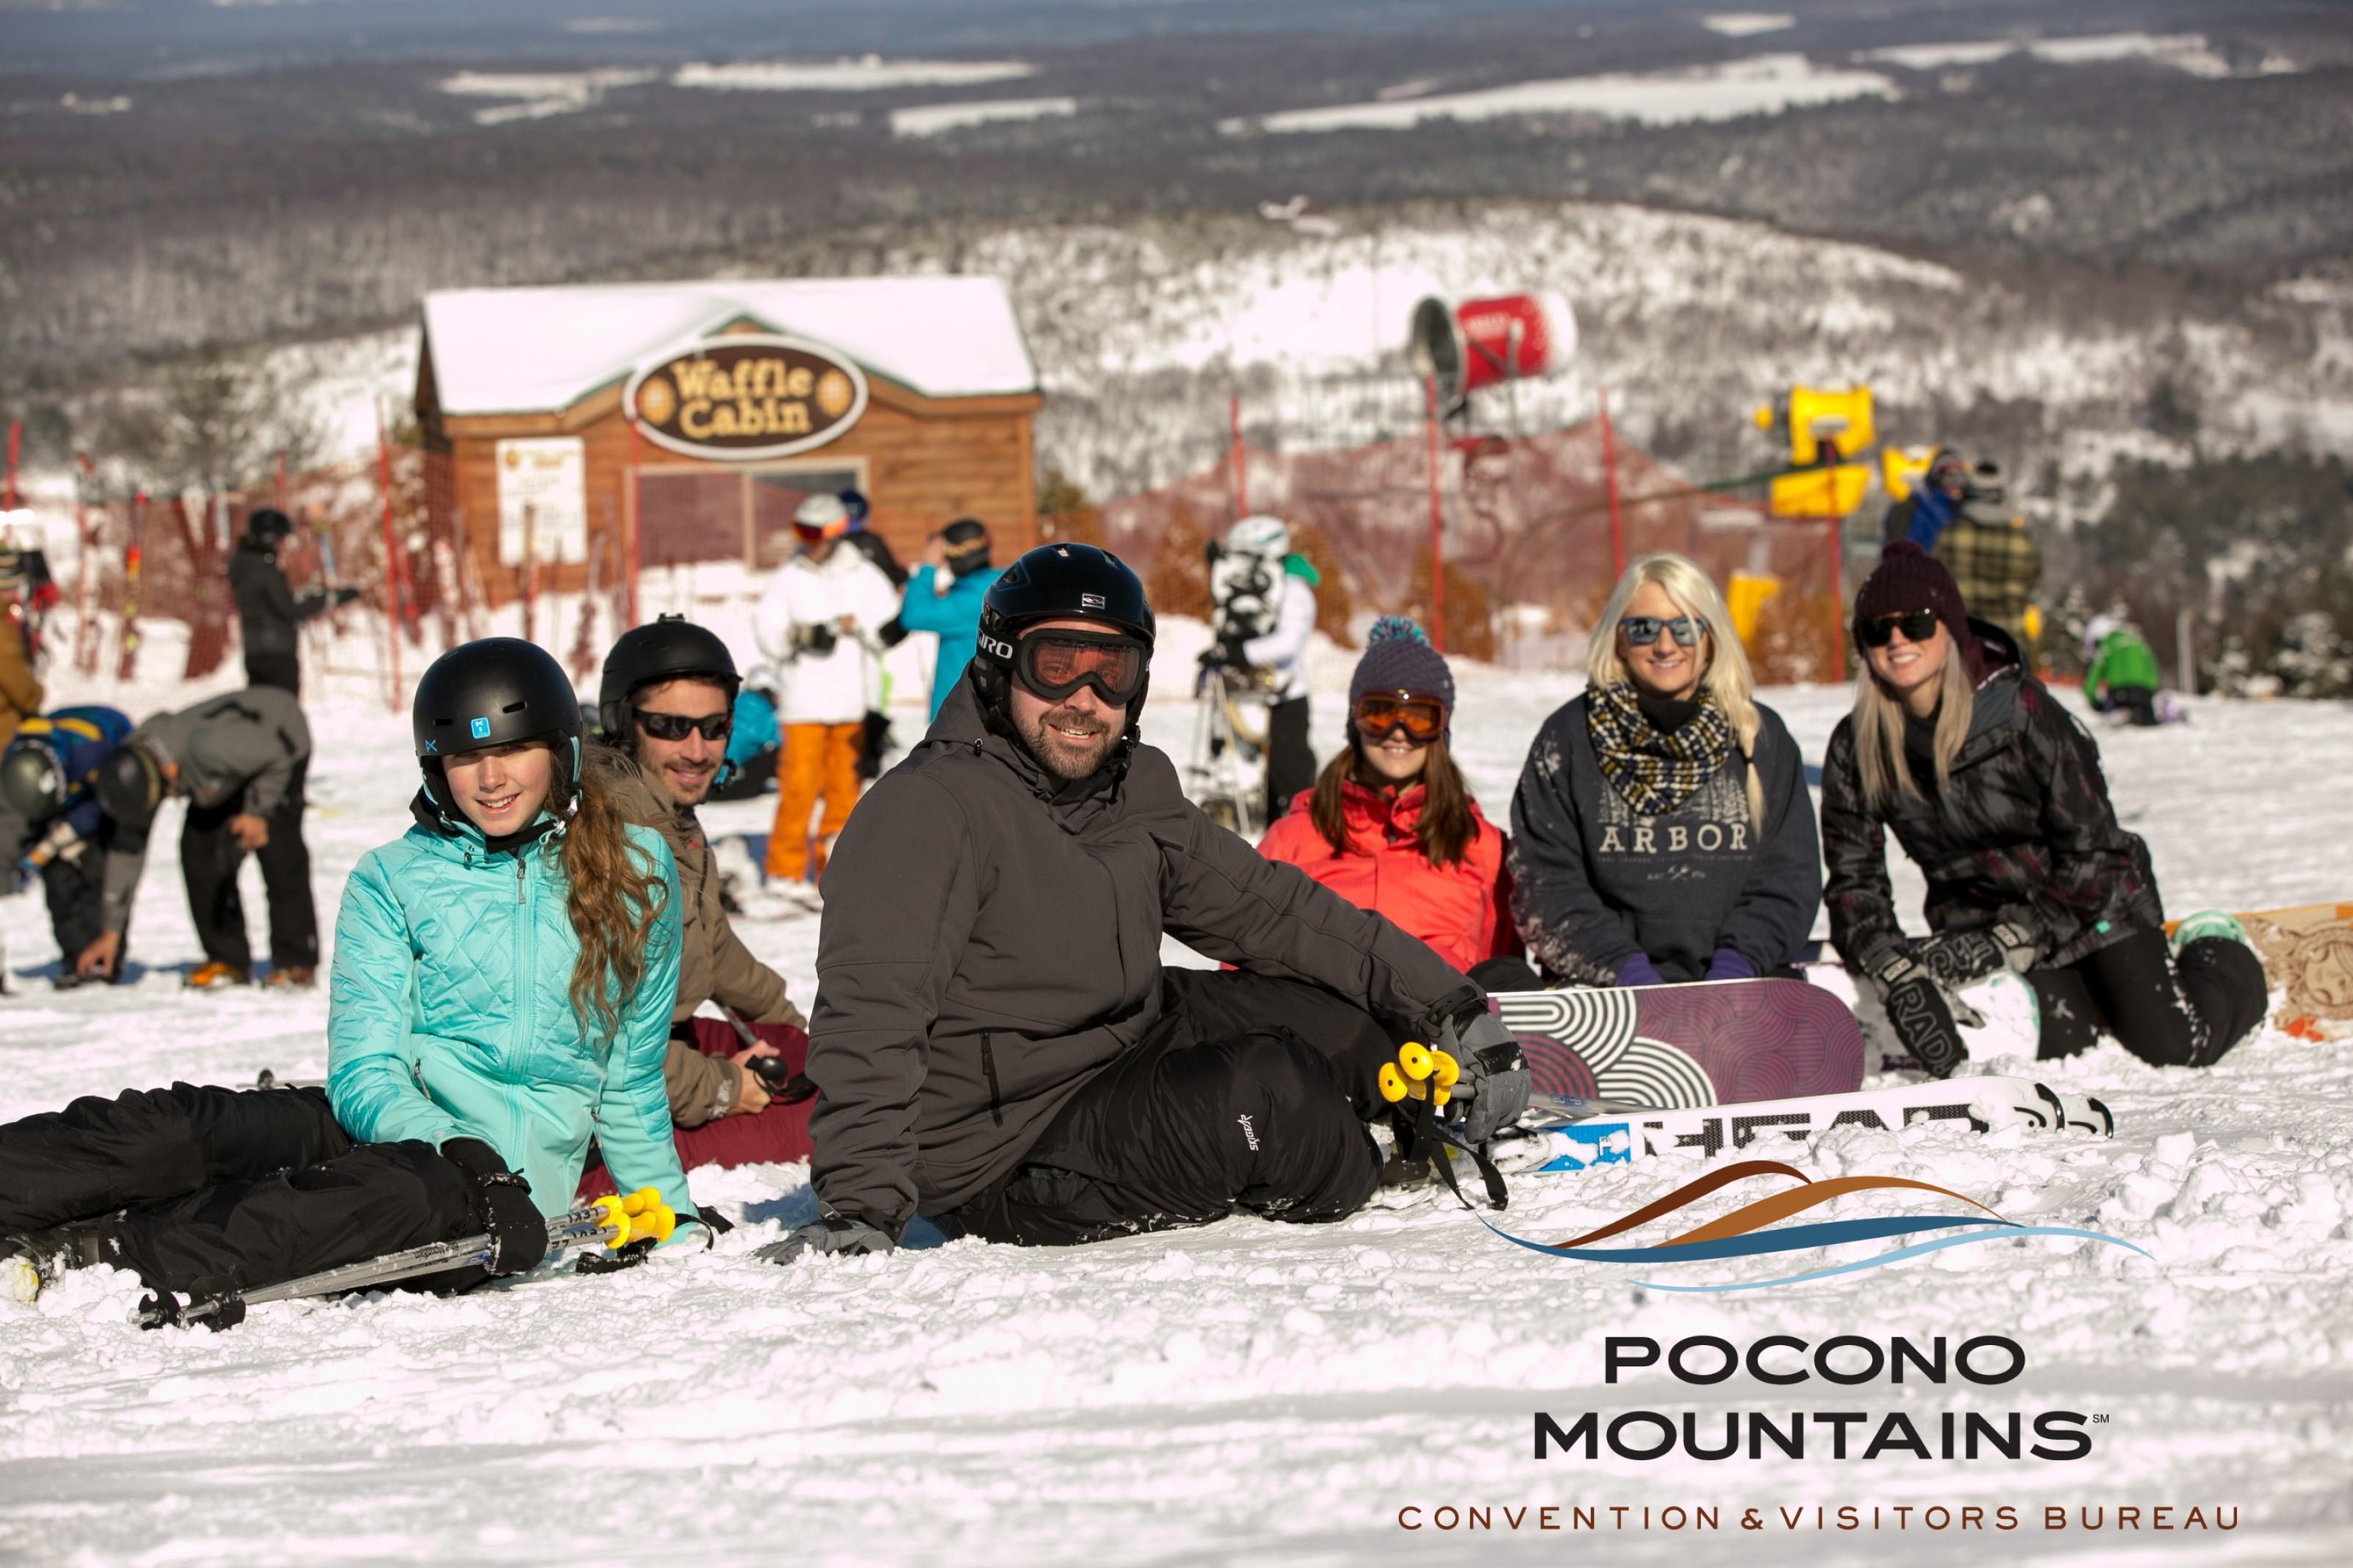 Pocono Mountains Convention and Visitors Bureau Welcomes PA FBLA